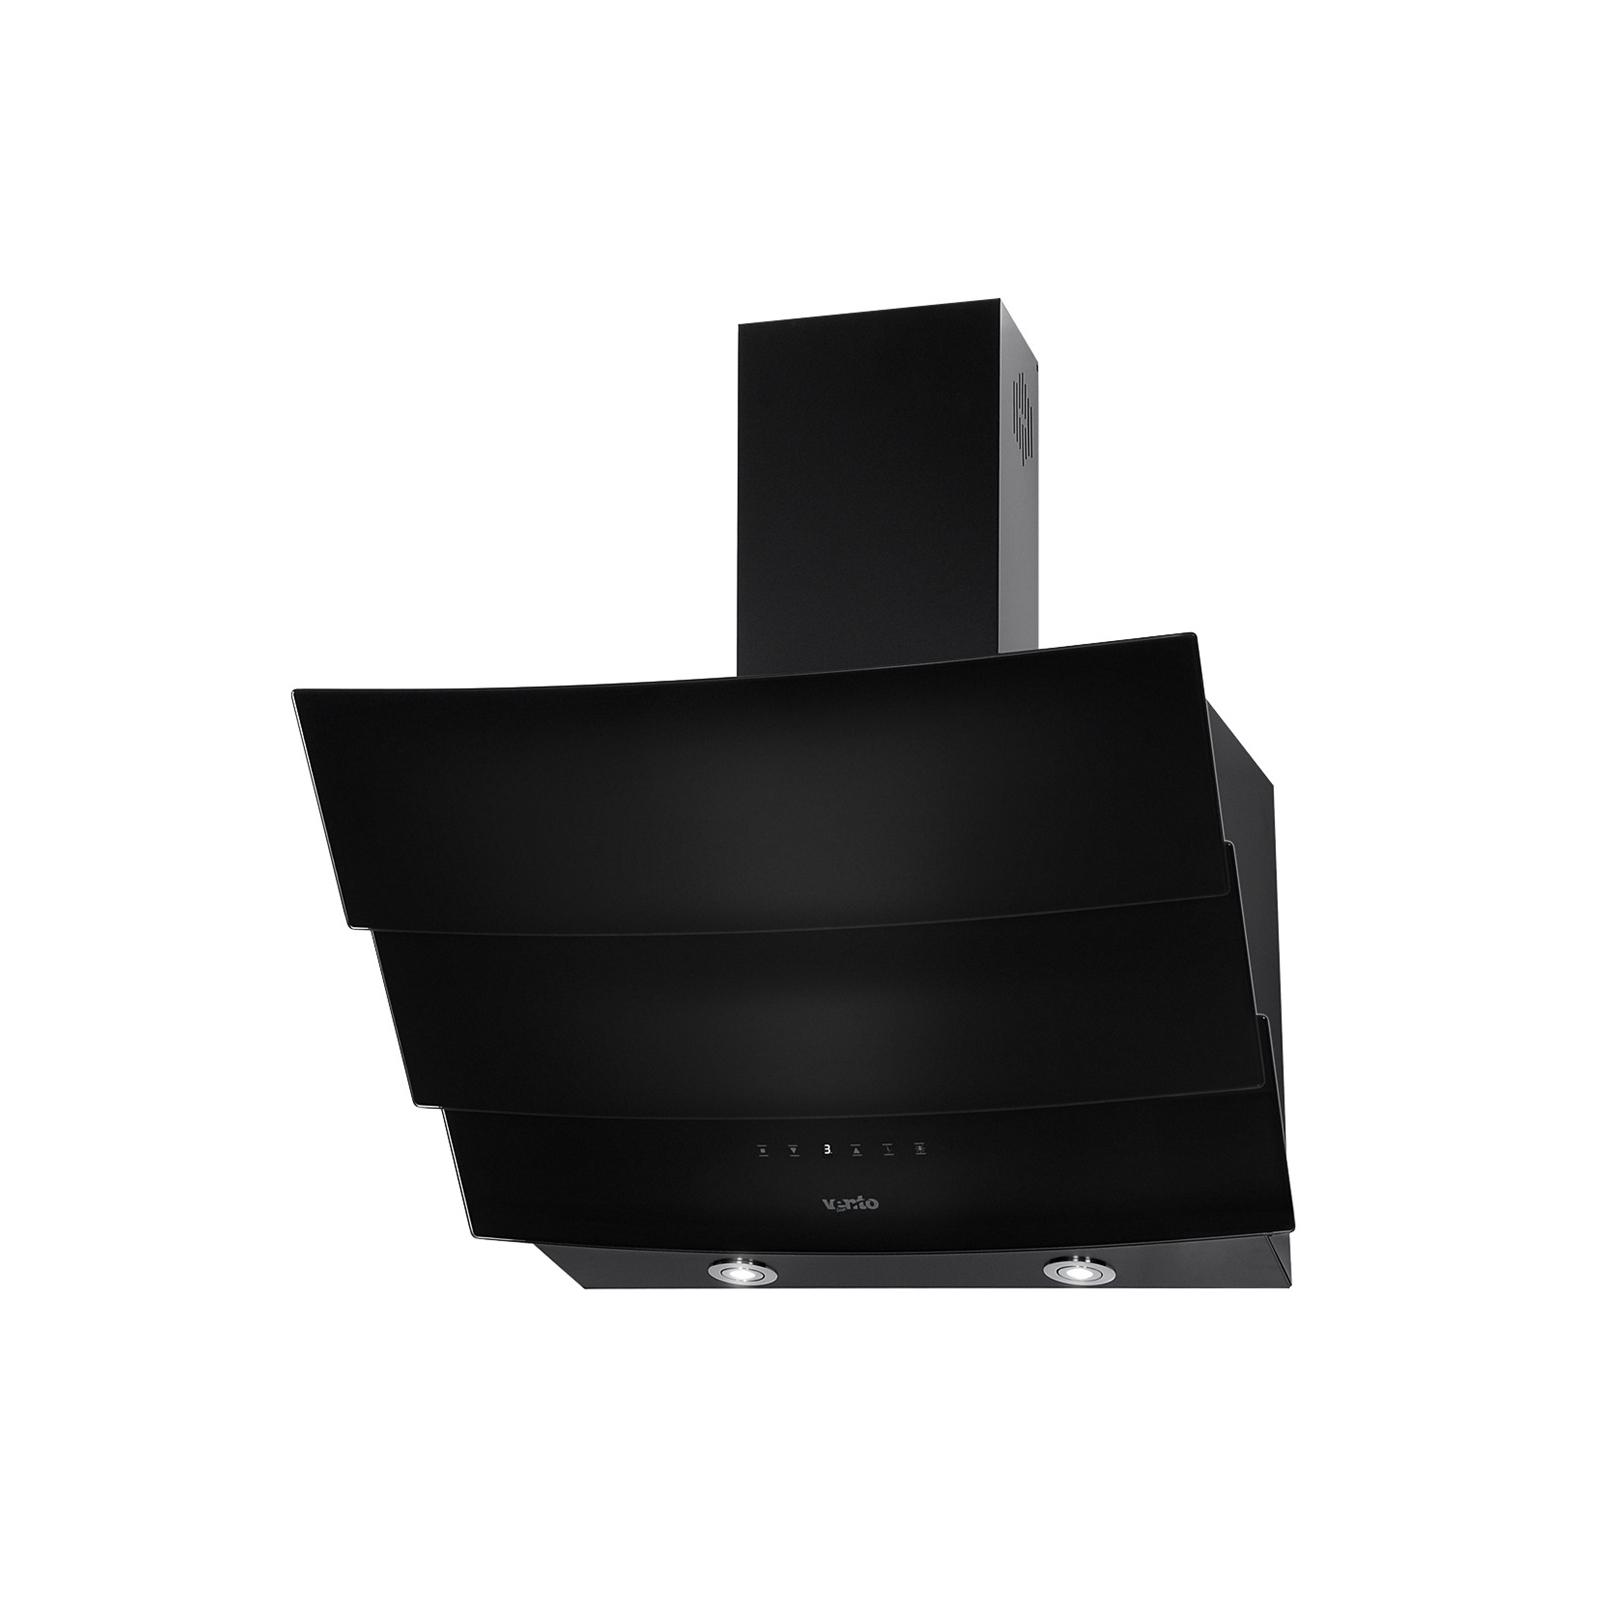 Вытяжка кухонная VENTOLUX RIALTO 60 BK (1000) TRC IT